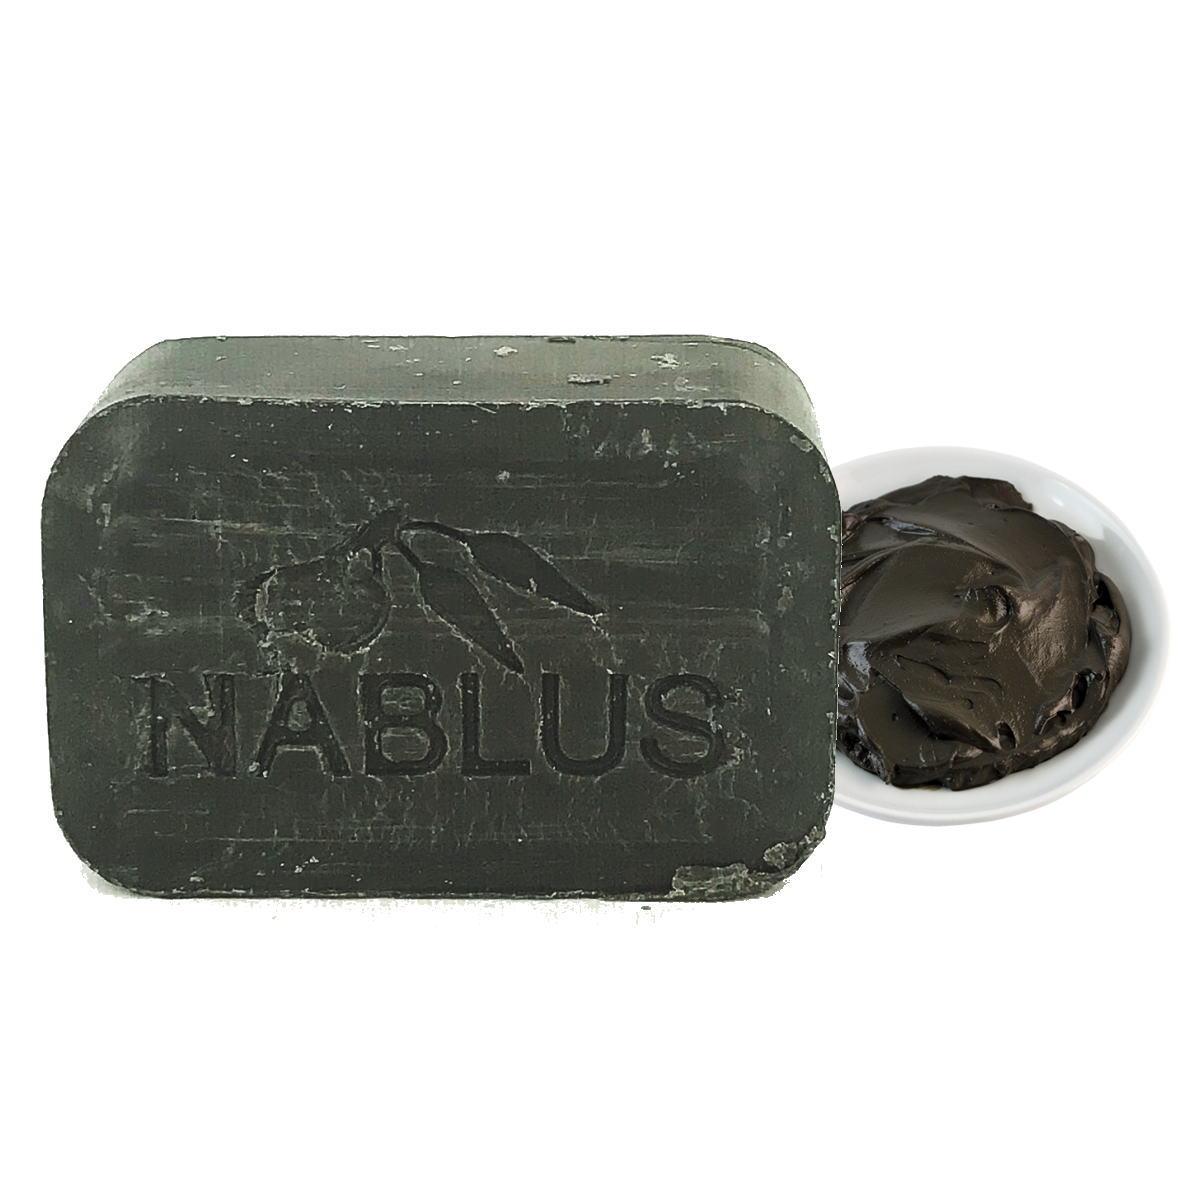 Nablus Soap ナーブルスソープ - 死海の泥 - 無添加 オーガニック石鹸